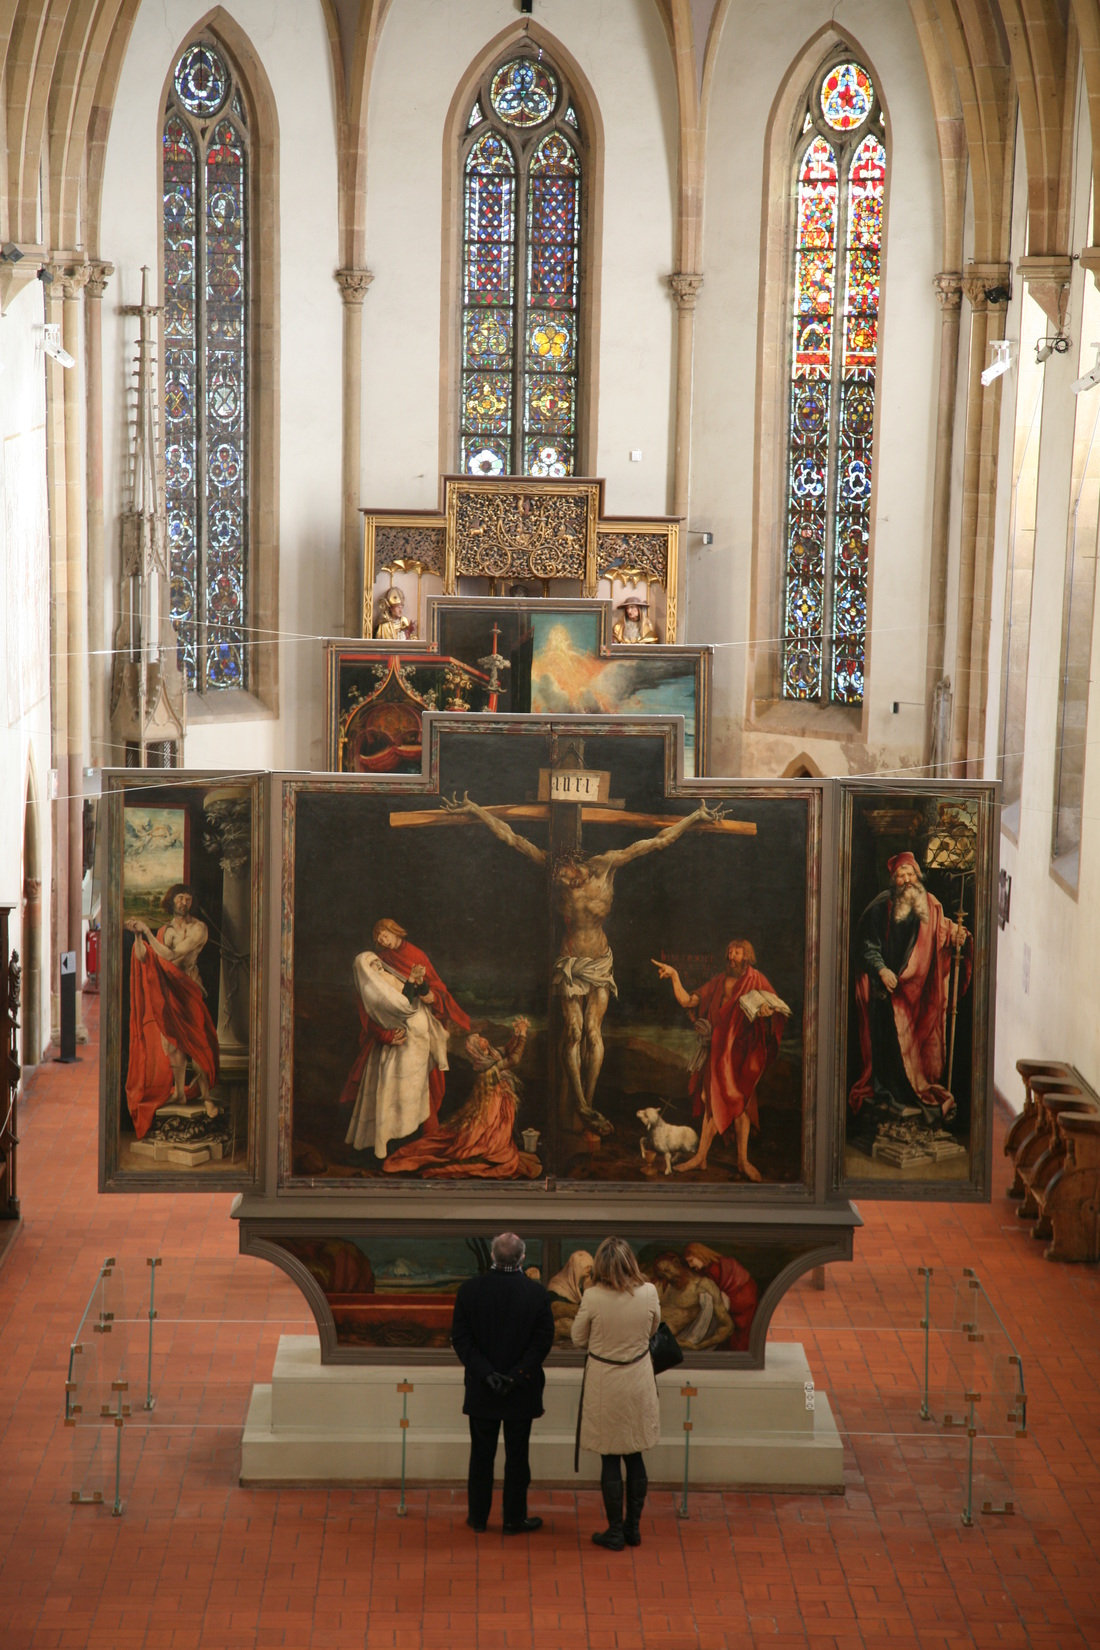 View of the Isenheim Altarpiece, Nikolaus Hagenauer and Matthias Grünewald, c 1512-1516